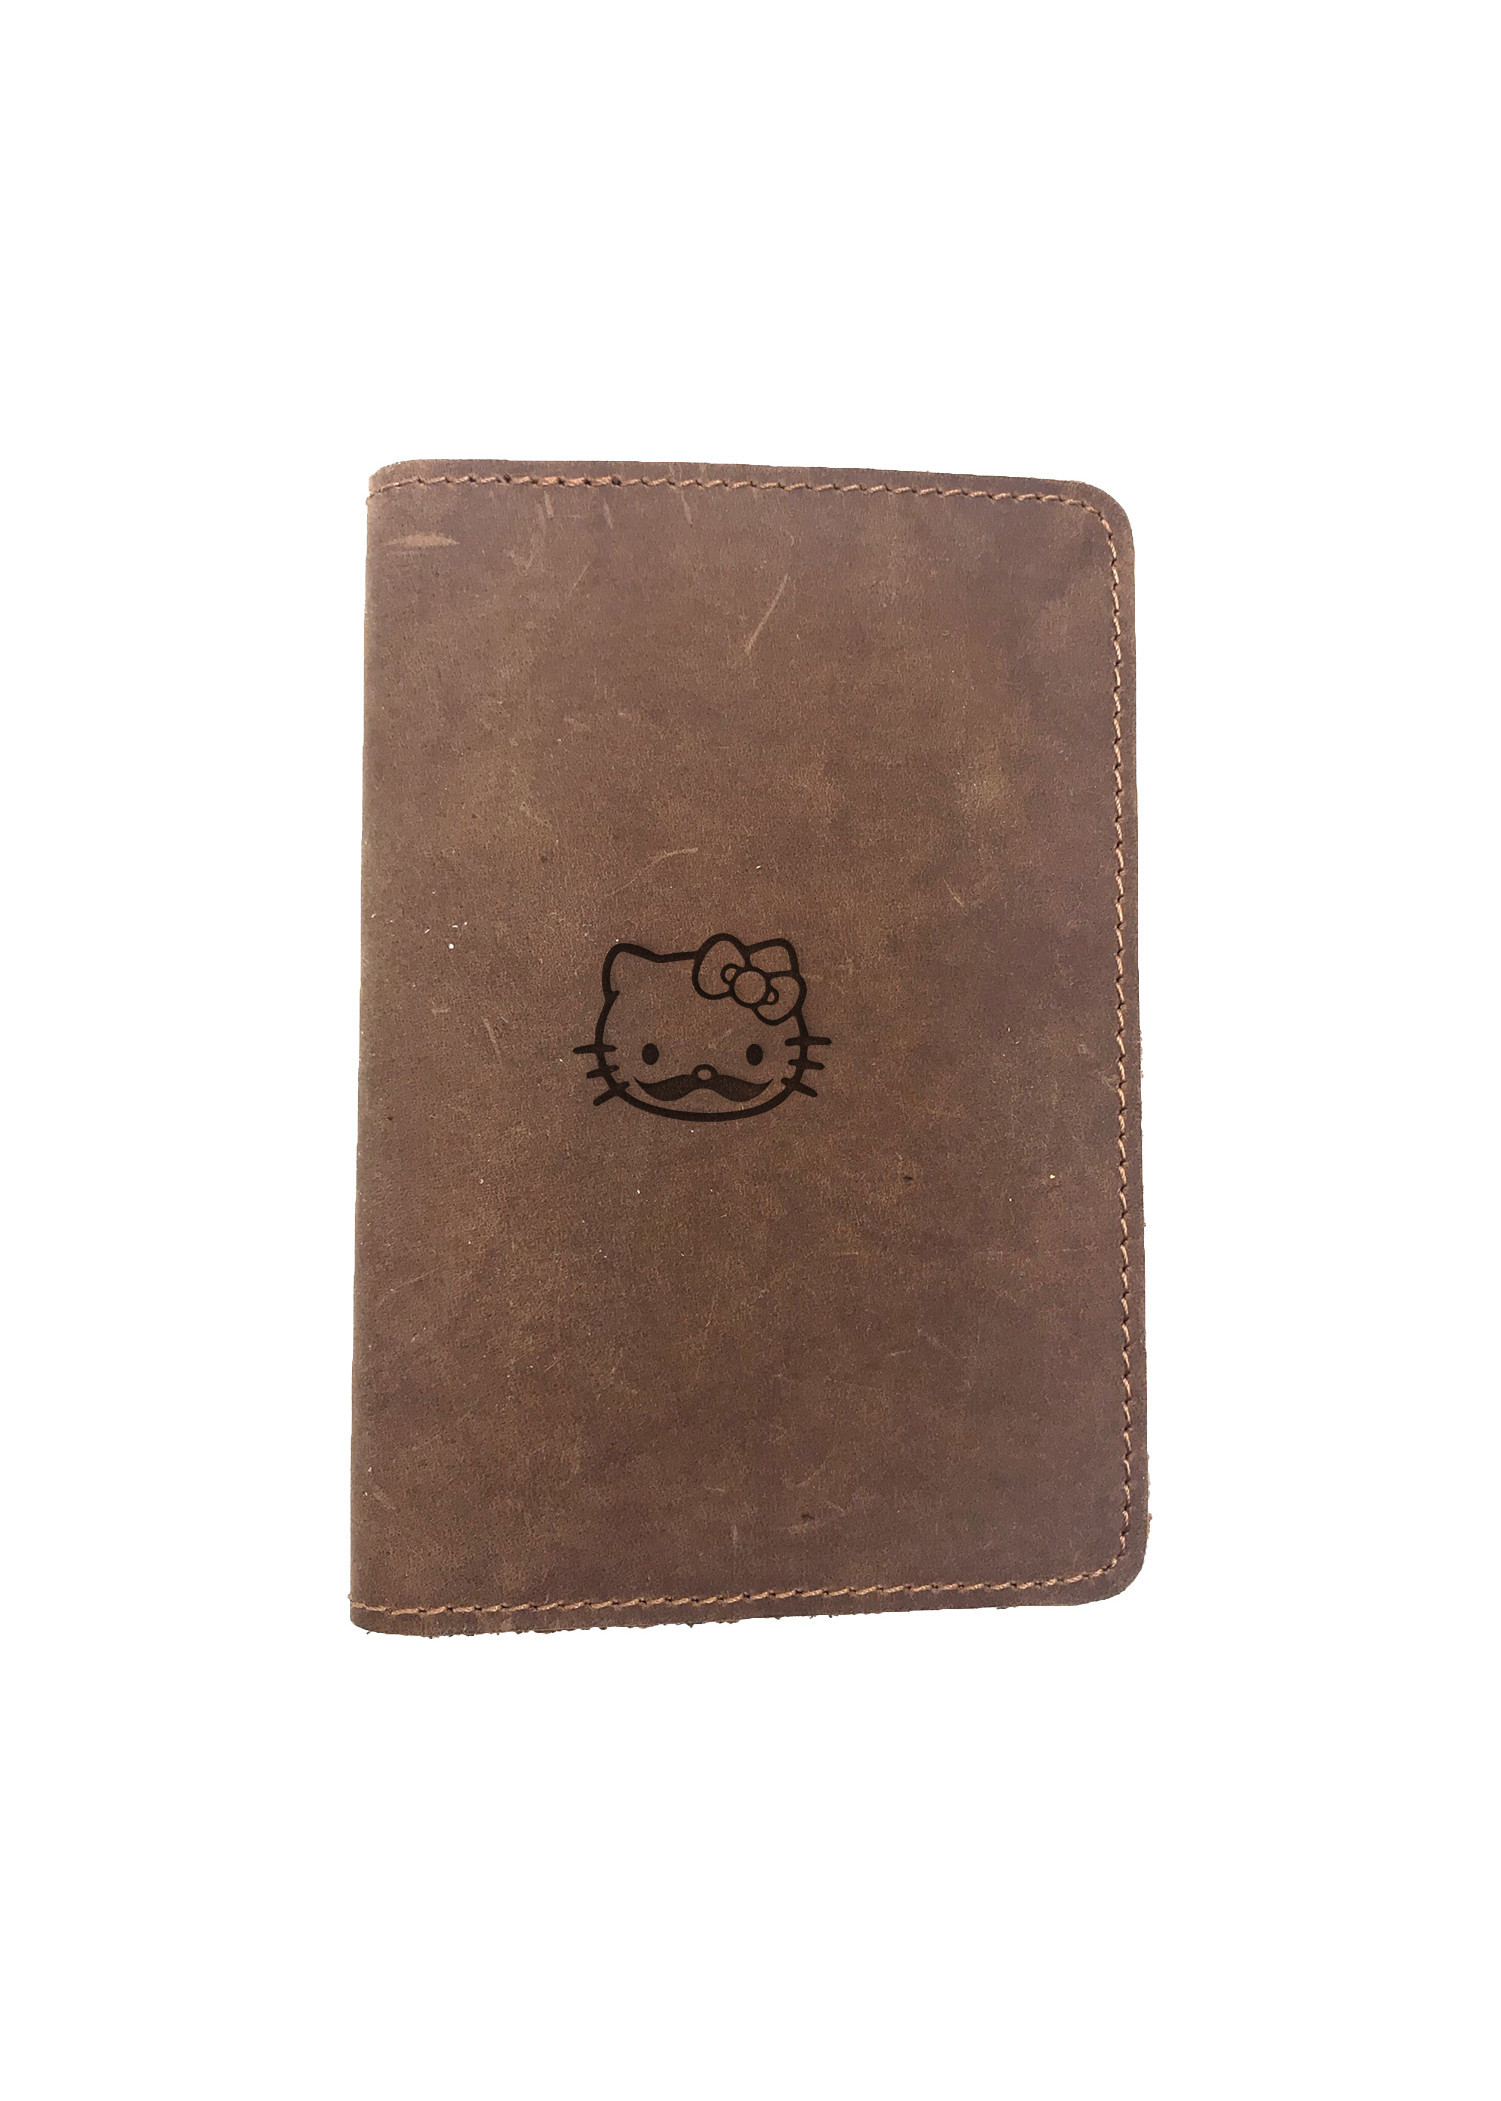 Passport Cover Bao Da Hộ Chiếu Da Sáp Khắc Hình Mèo HELLO WITH BEARD HELLO KITTY (BROWN)